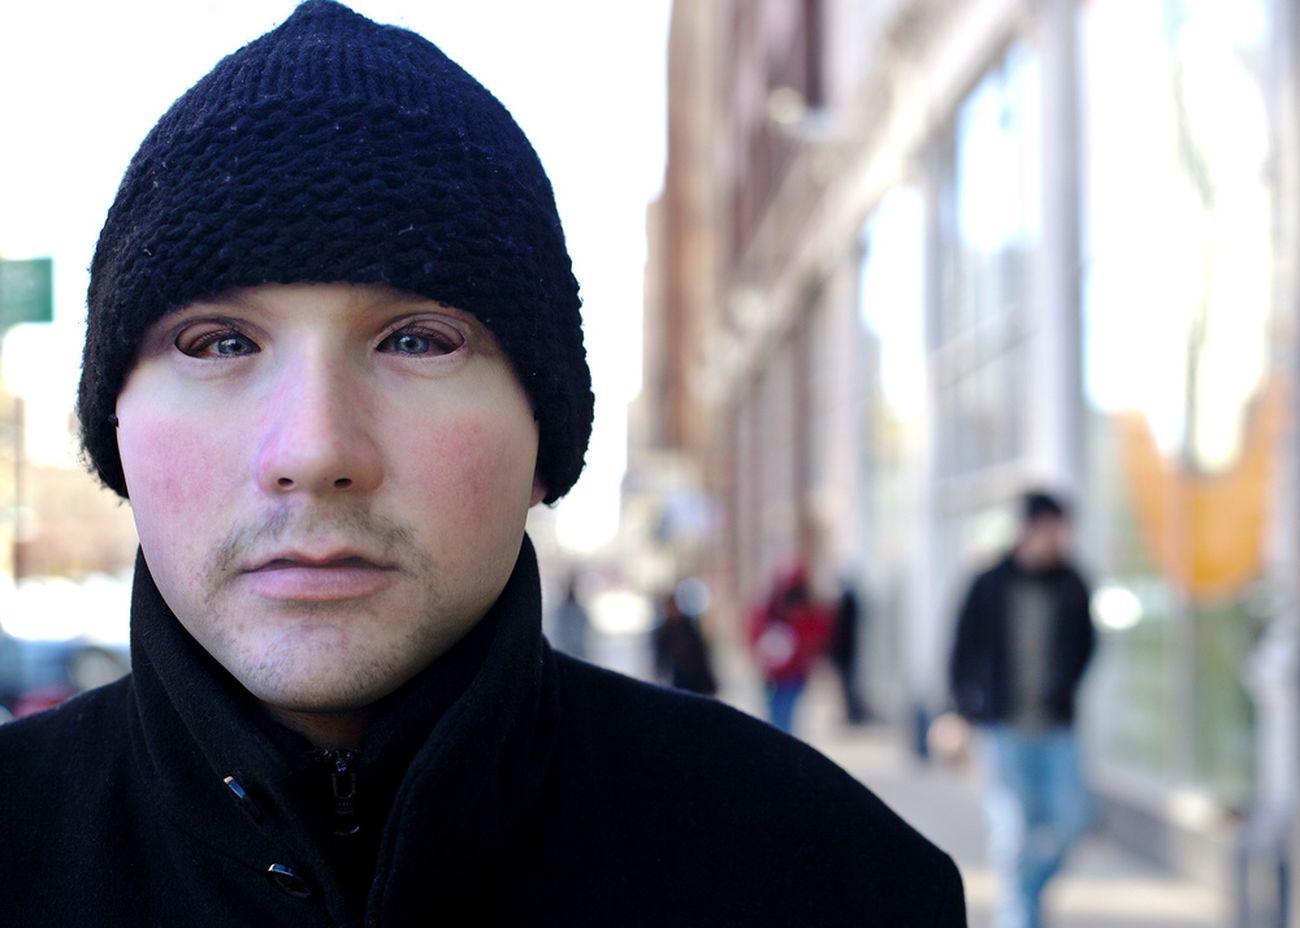 Leo Selvaggio, URME Surveillance Identity Prosthetic